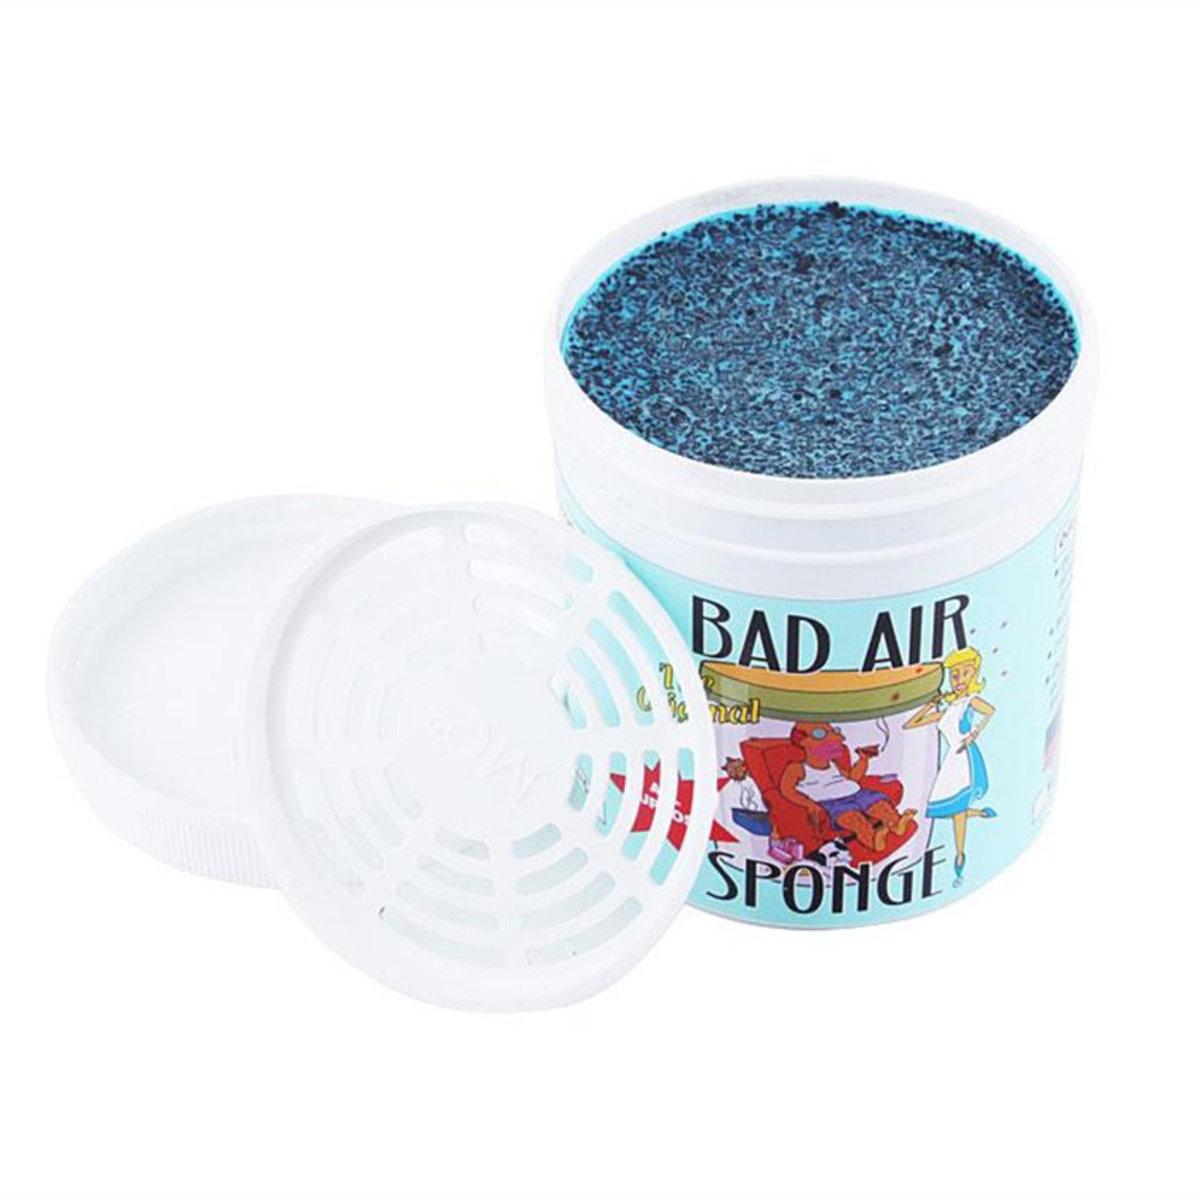 Bad Air Sponge (parallel imports)